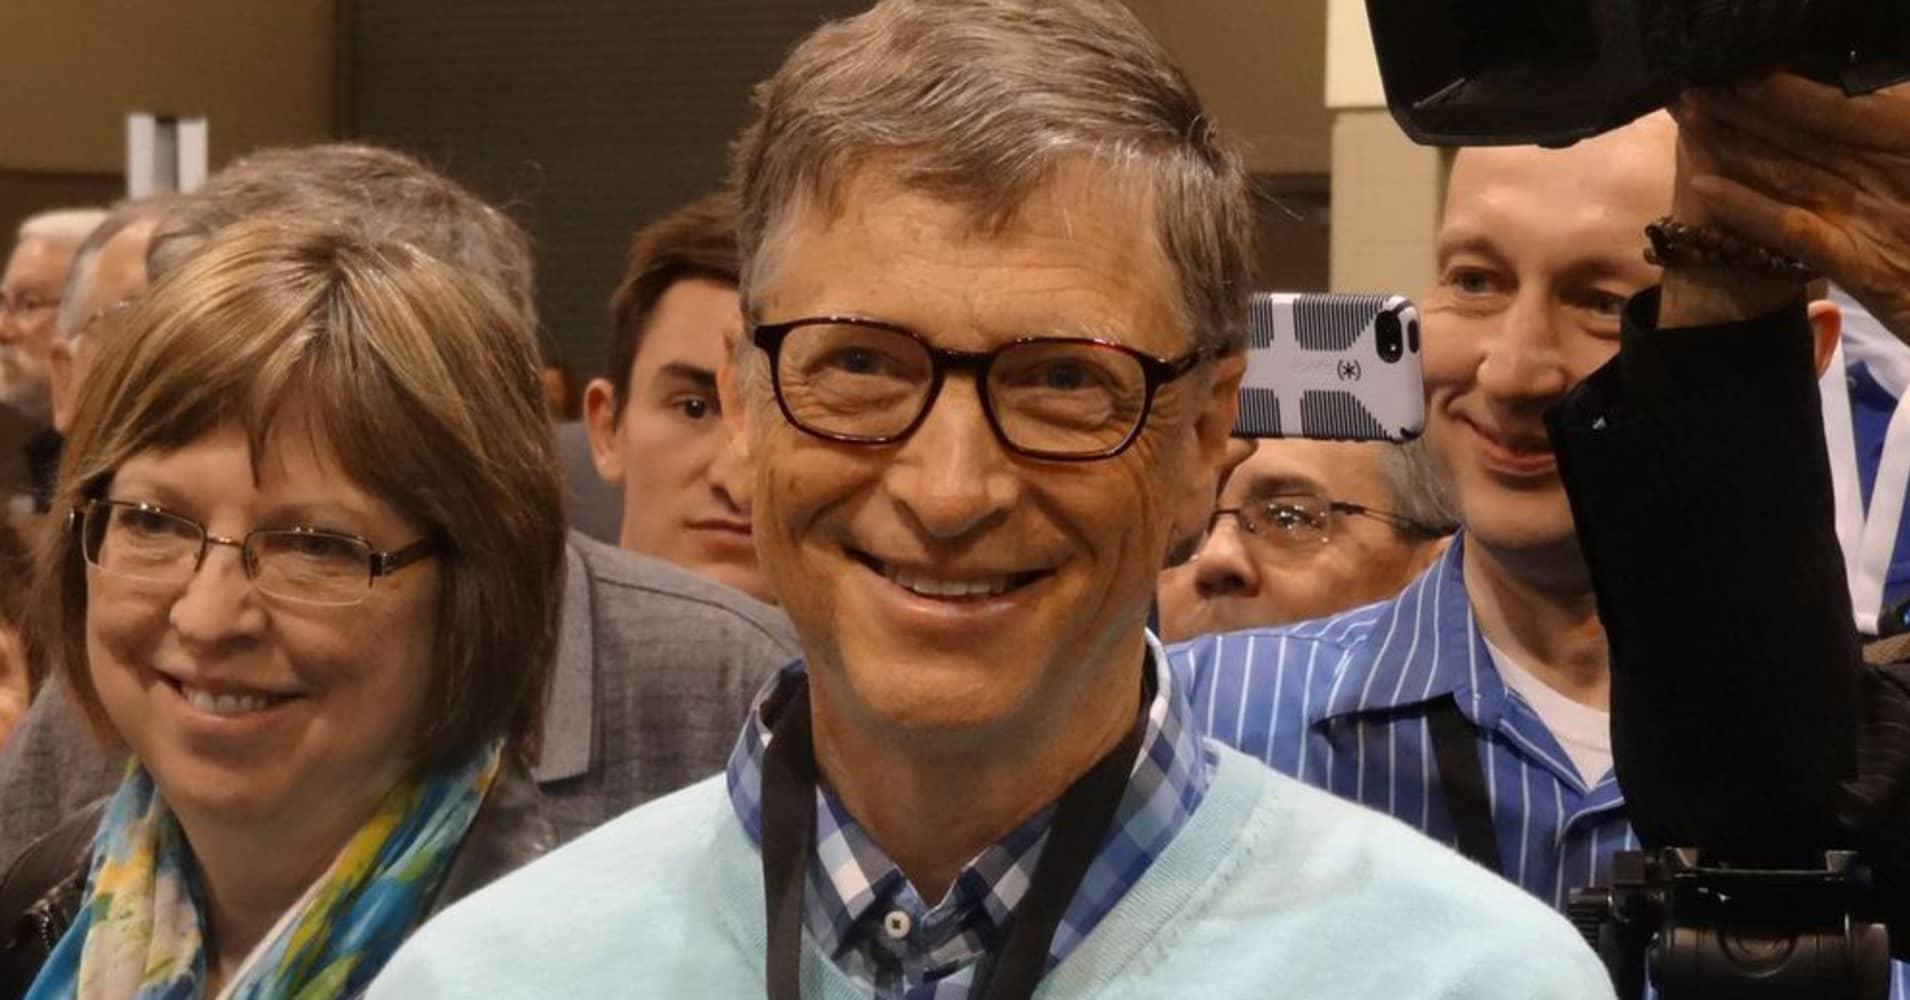 Bill Gates At The Berkshire Hathaway Annual Shareholder's Meeting In Omaha,  Nebraska